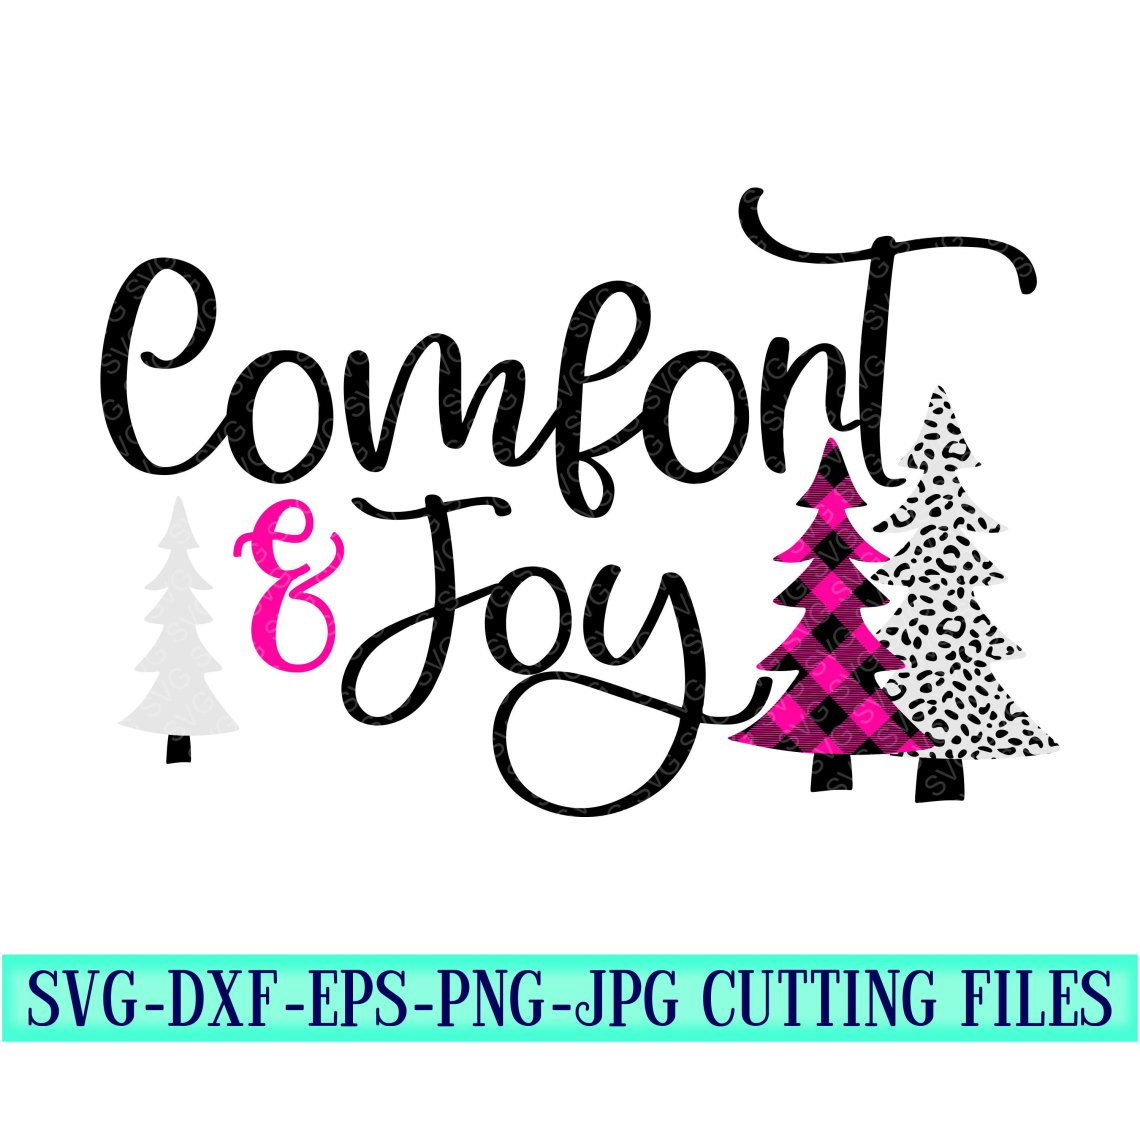 Download comfort and joy svg, christmas tree svg, plaid svg ...